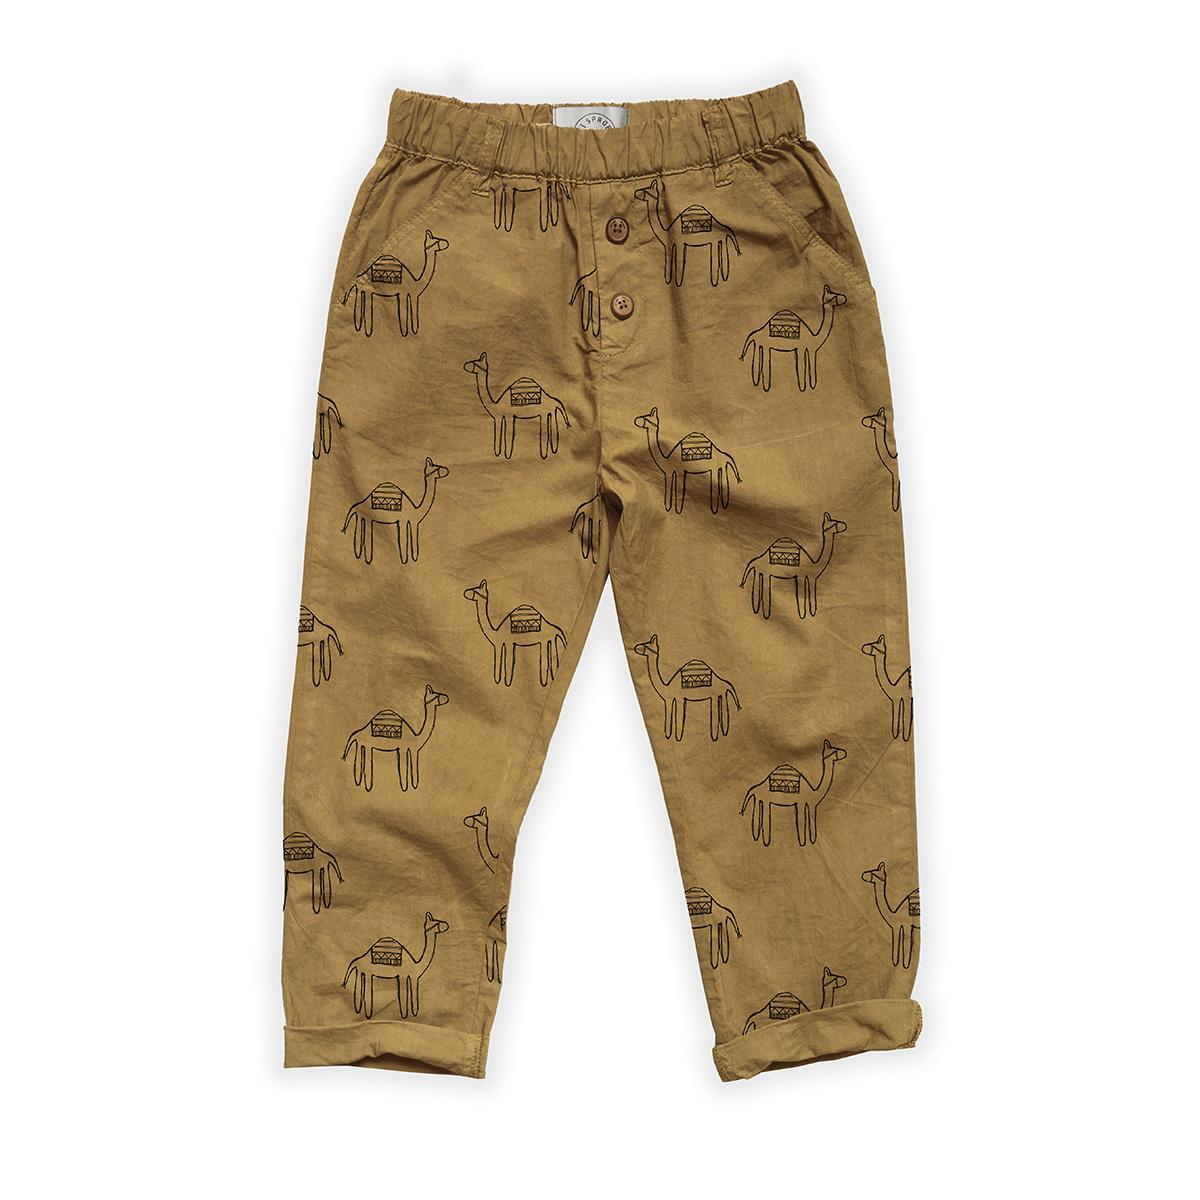 Sproet & Sprout Woven pants Camel Print | Desert